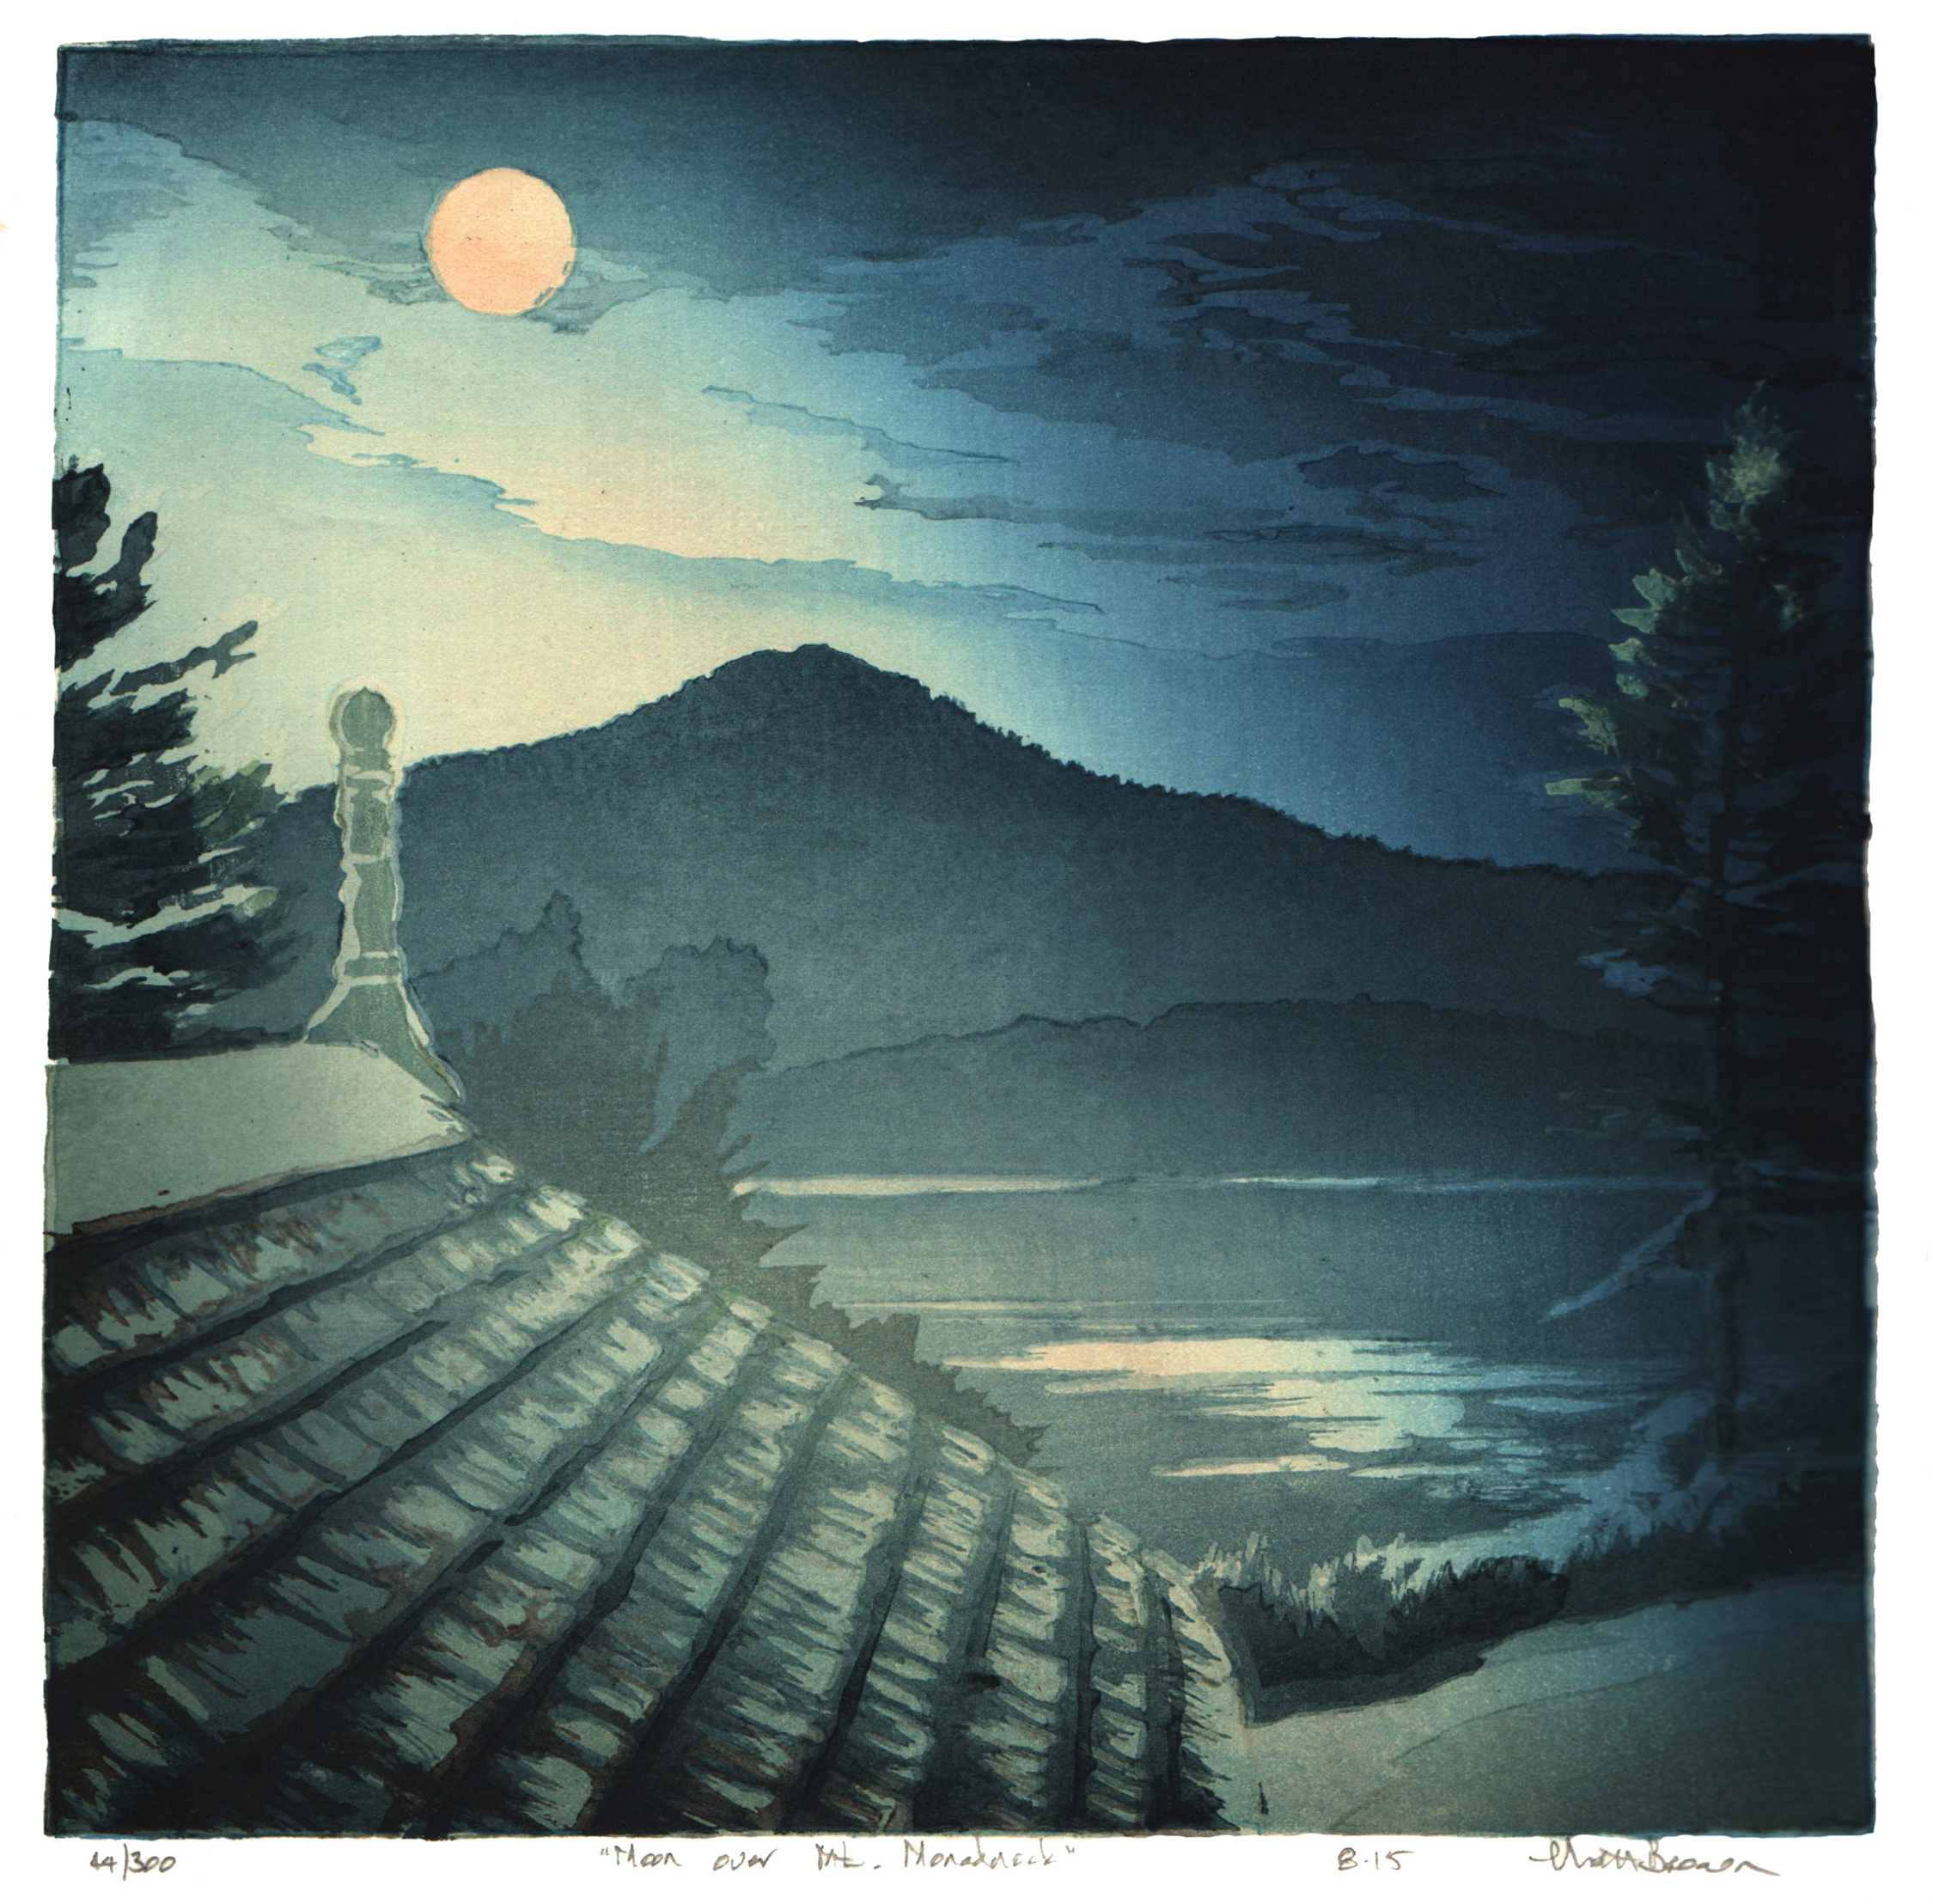 Moon Over Mt. Monadnock